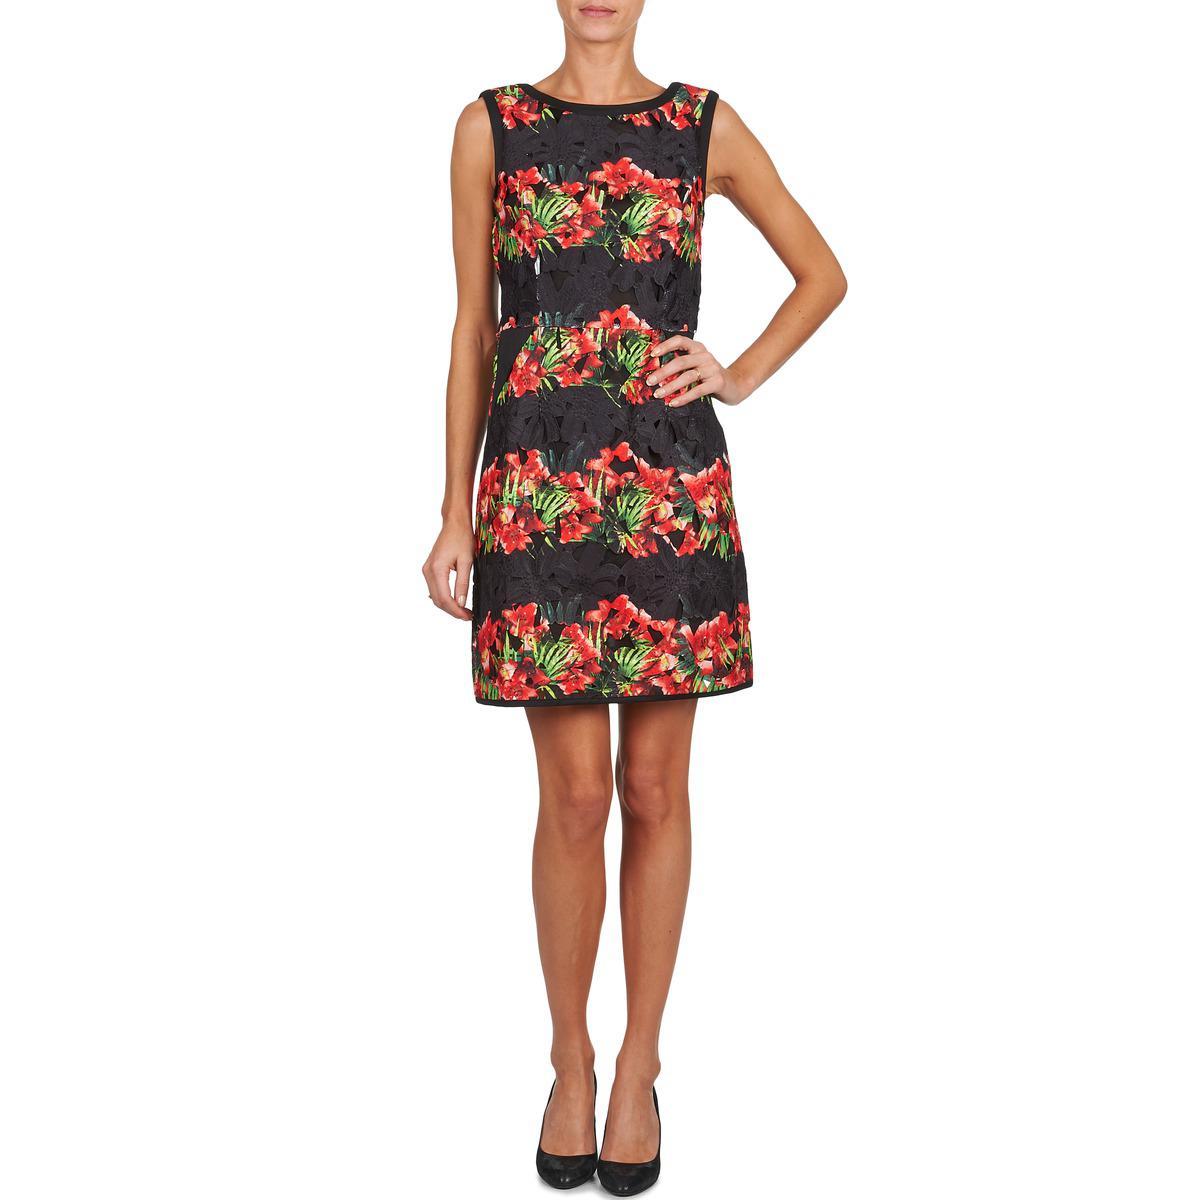 Womens tain Short Sleeve Dress Derhy cYJ83LLEn